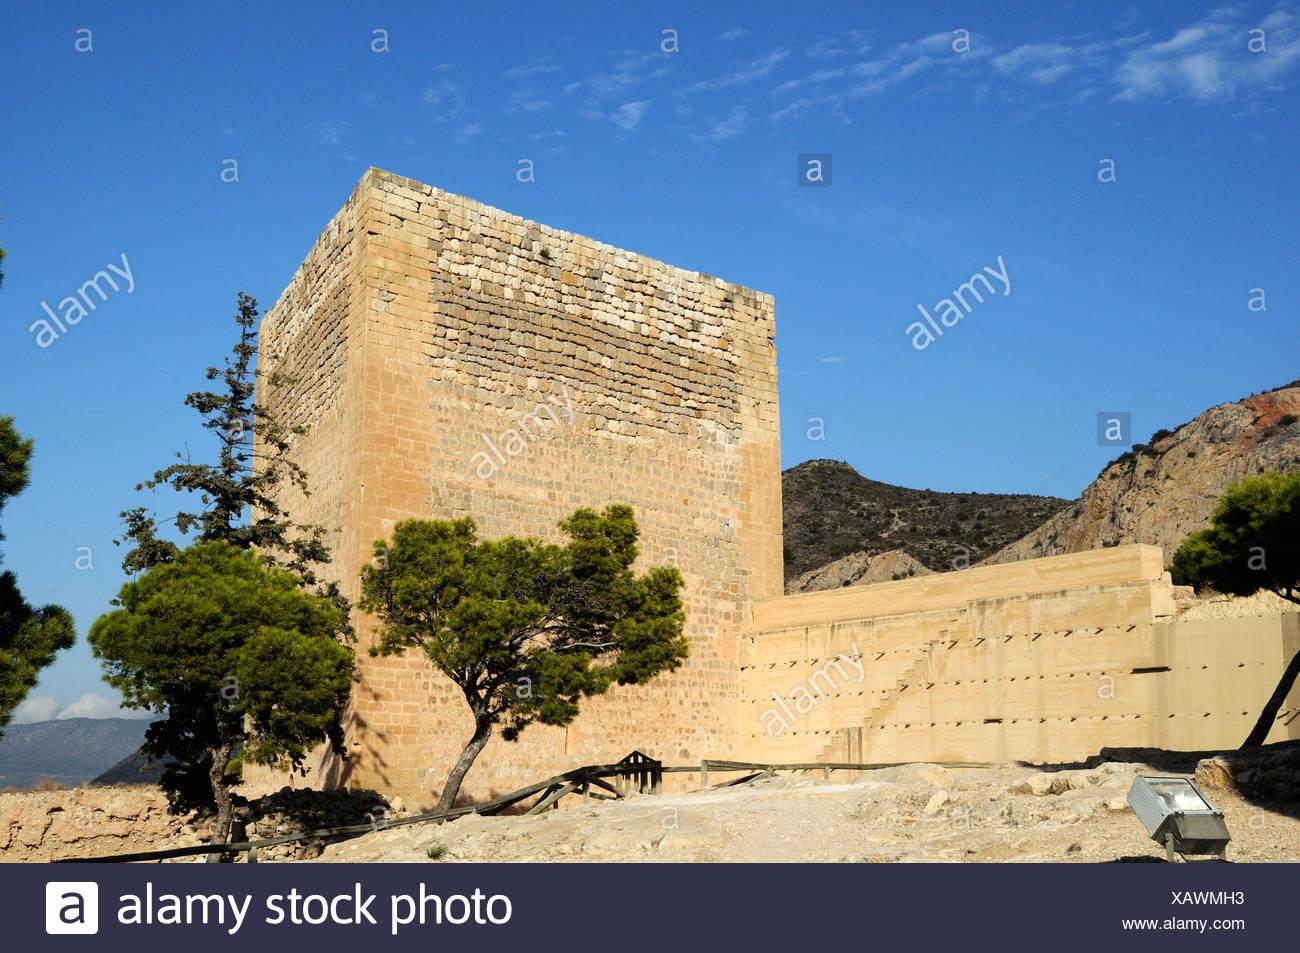 Ruins of La Mola's Castle, fortress from the Moorish era, Novelda, Costa Blanca, Spain, Europe - Stock Image